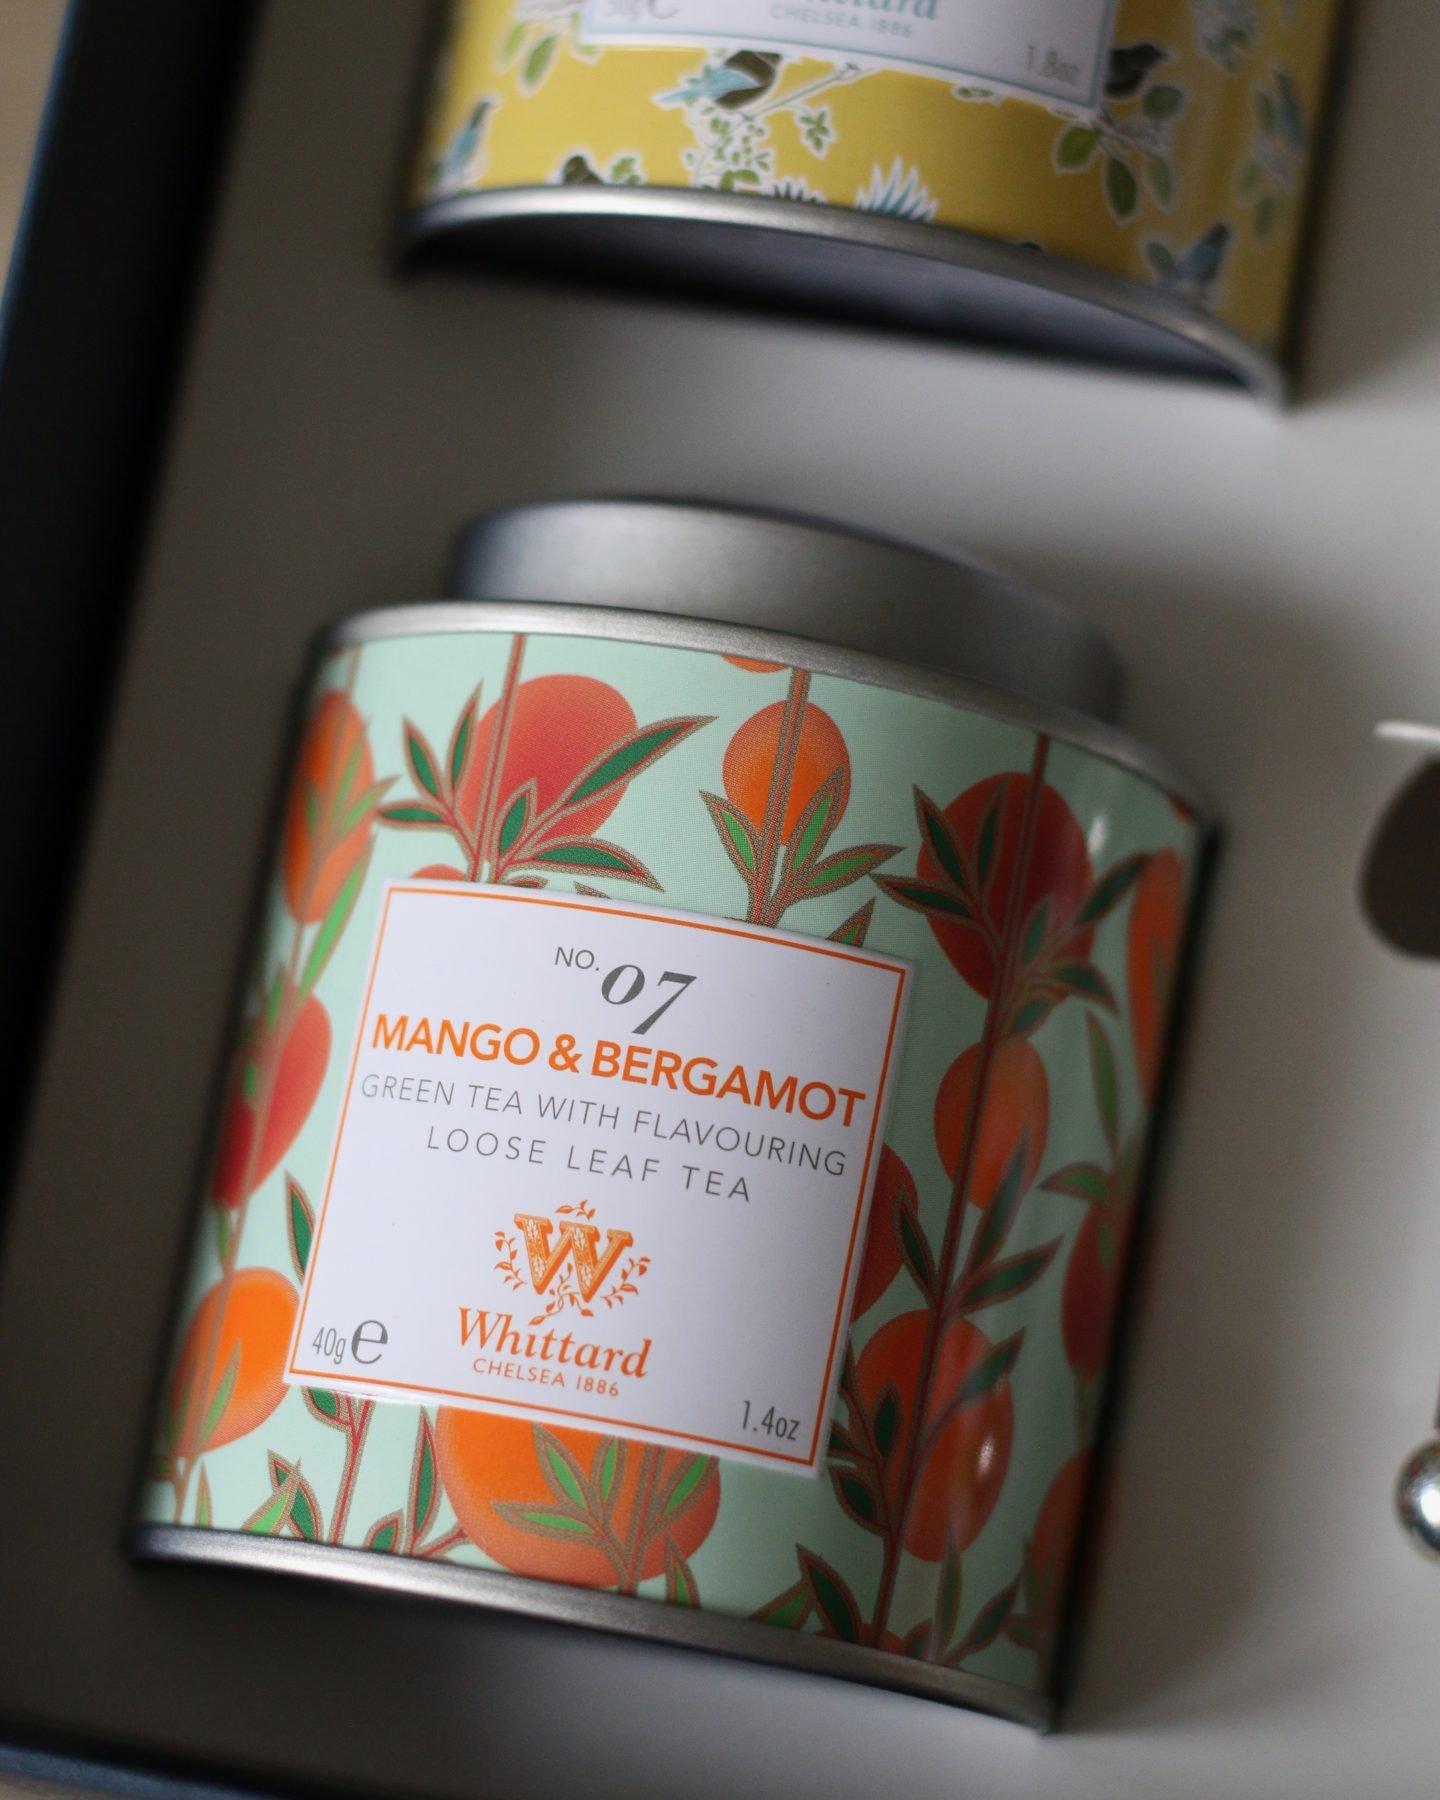 whittard mango & bergamot green loose leaf tea